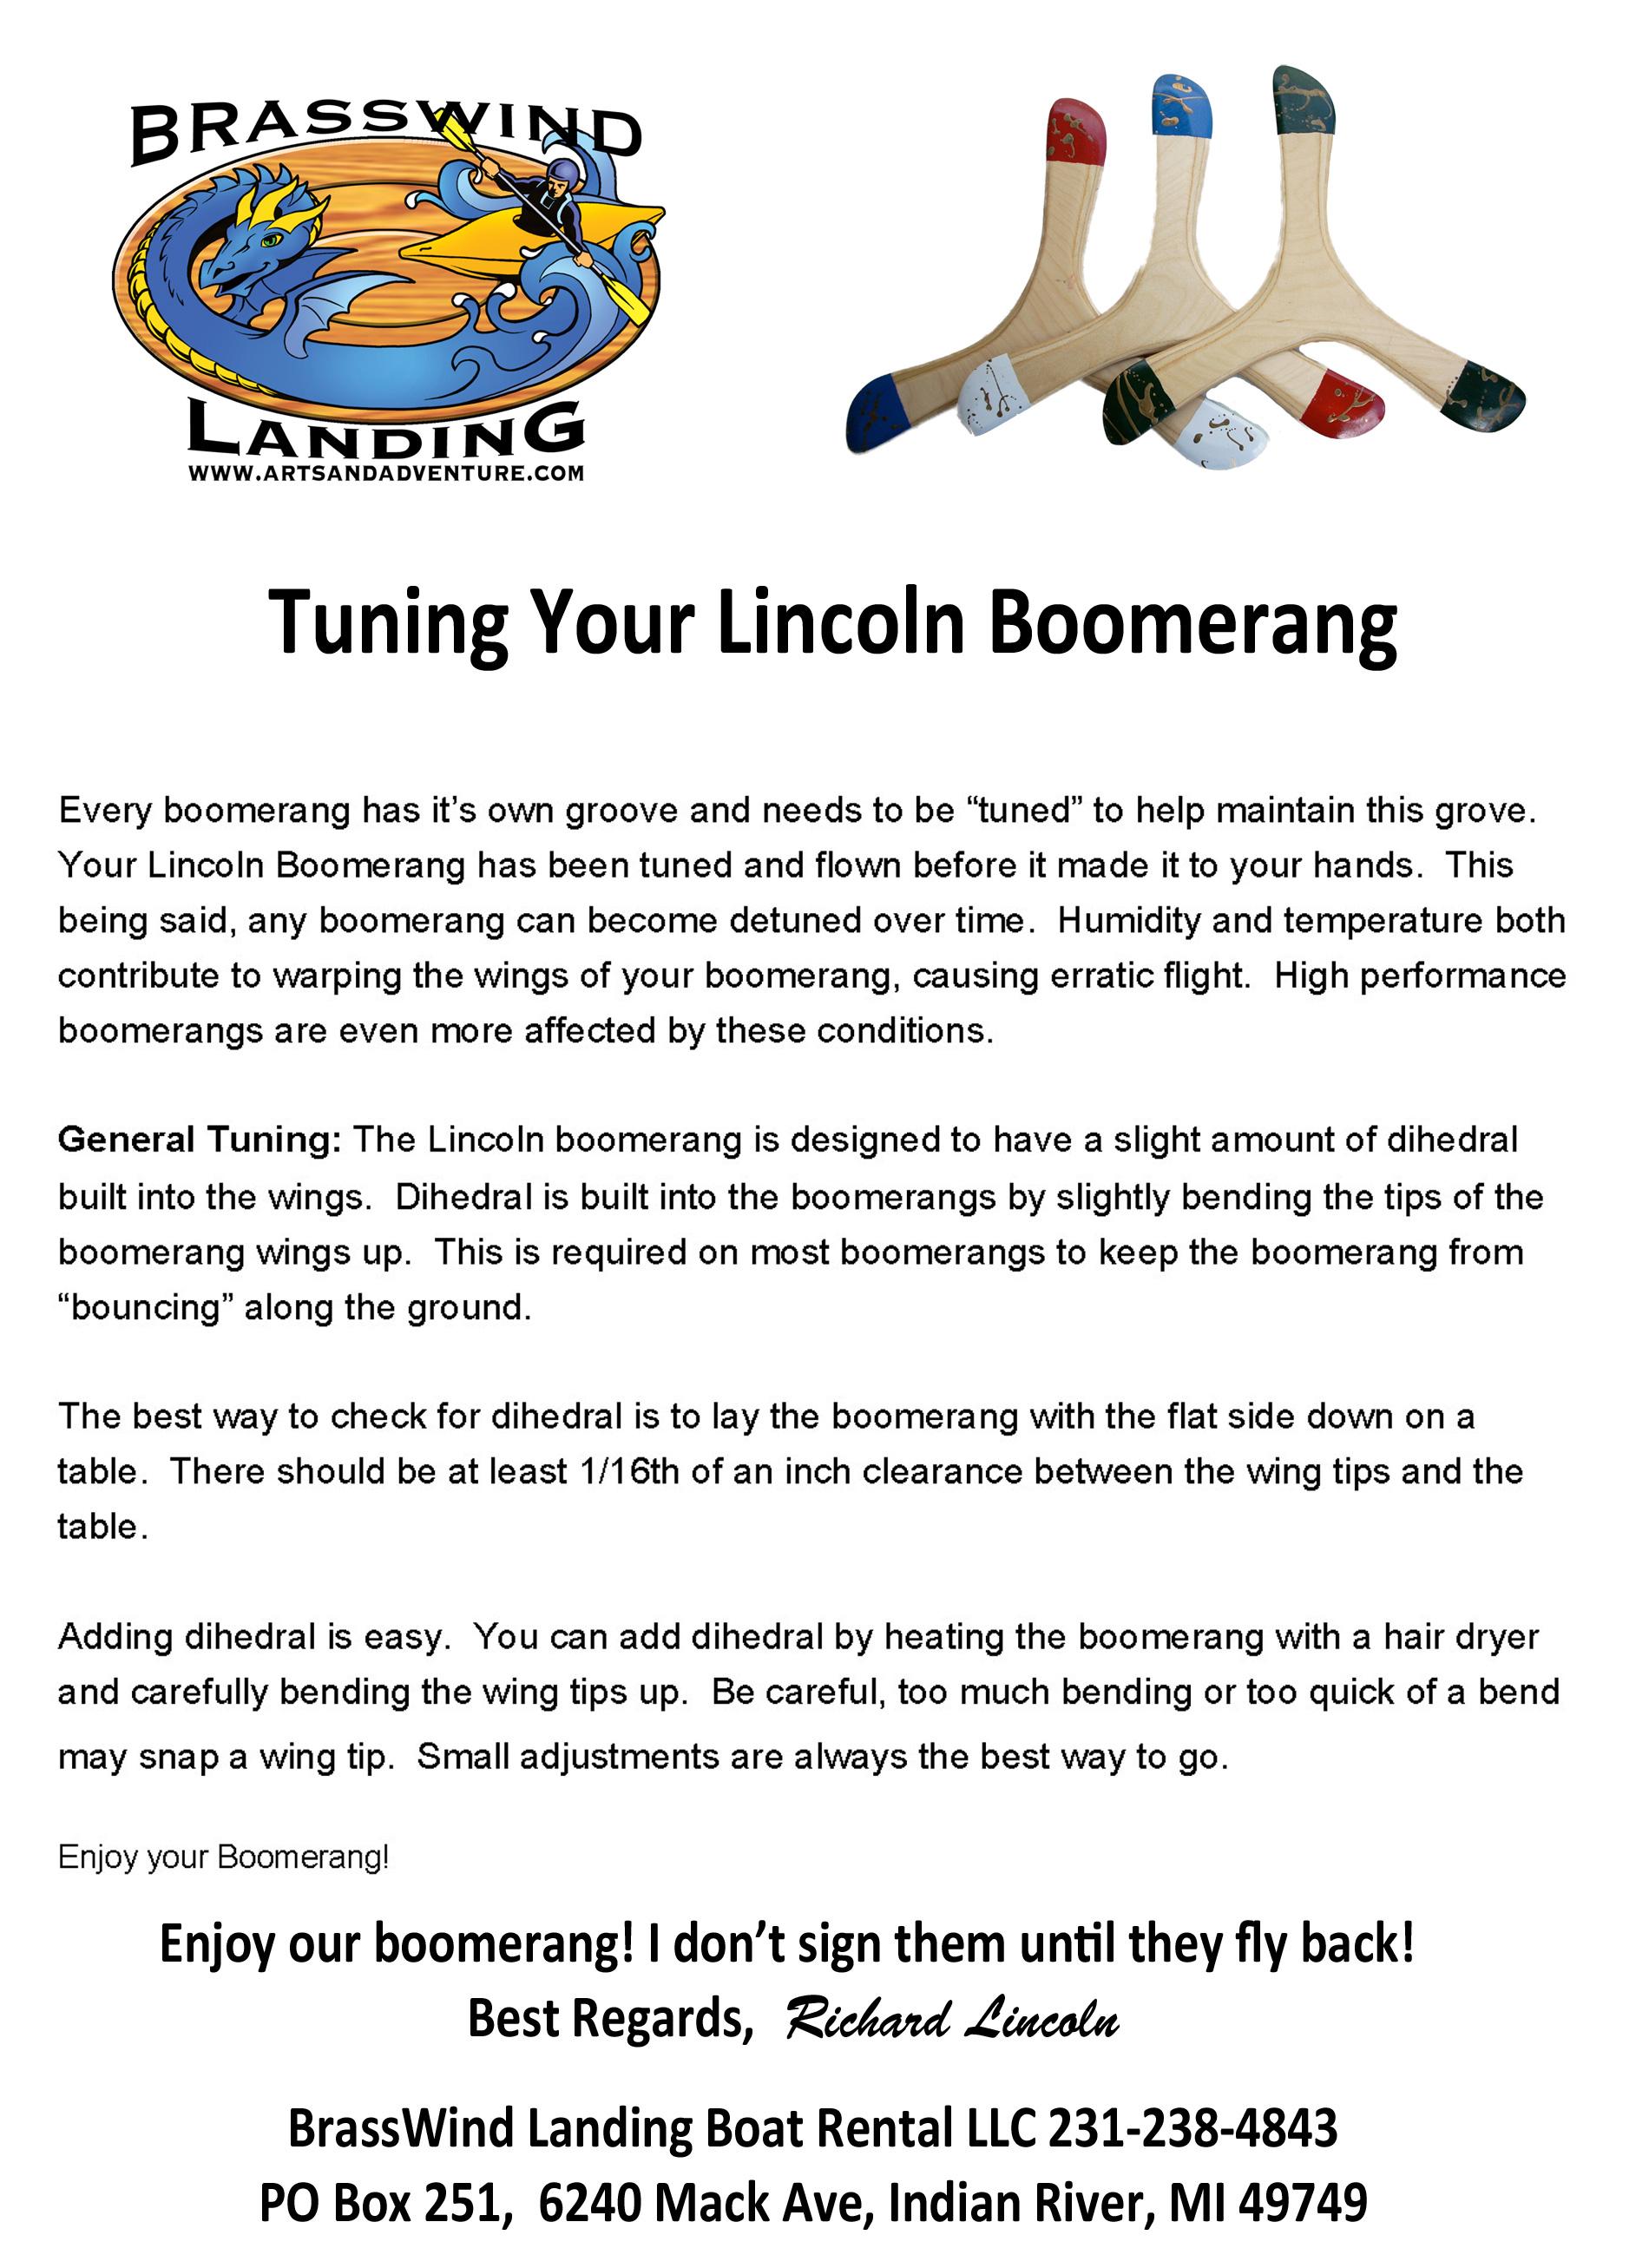 tuning boomerang flyer - image